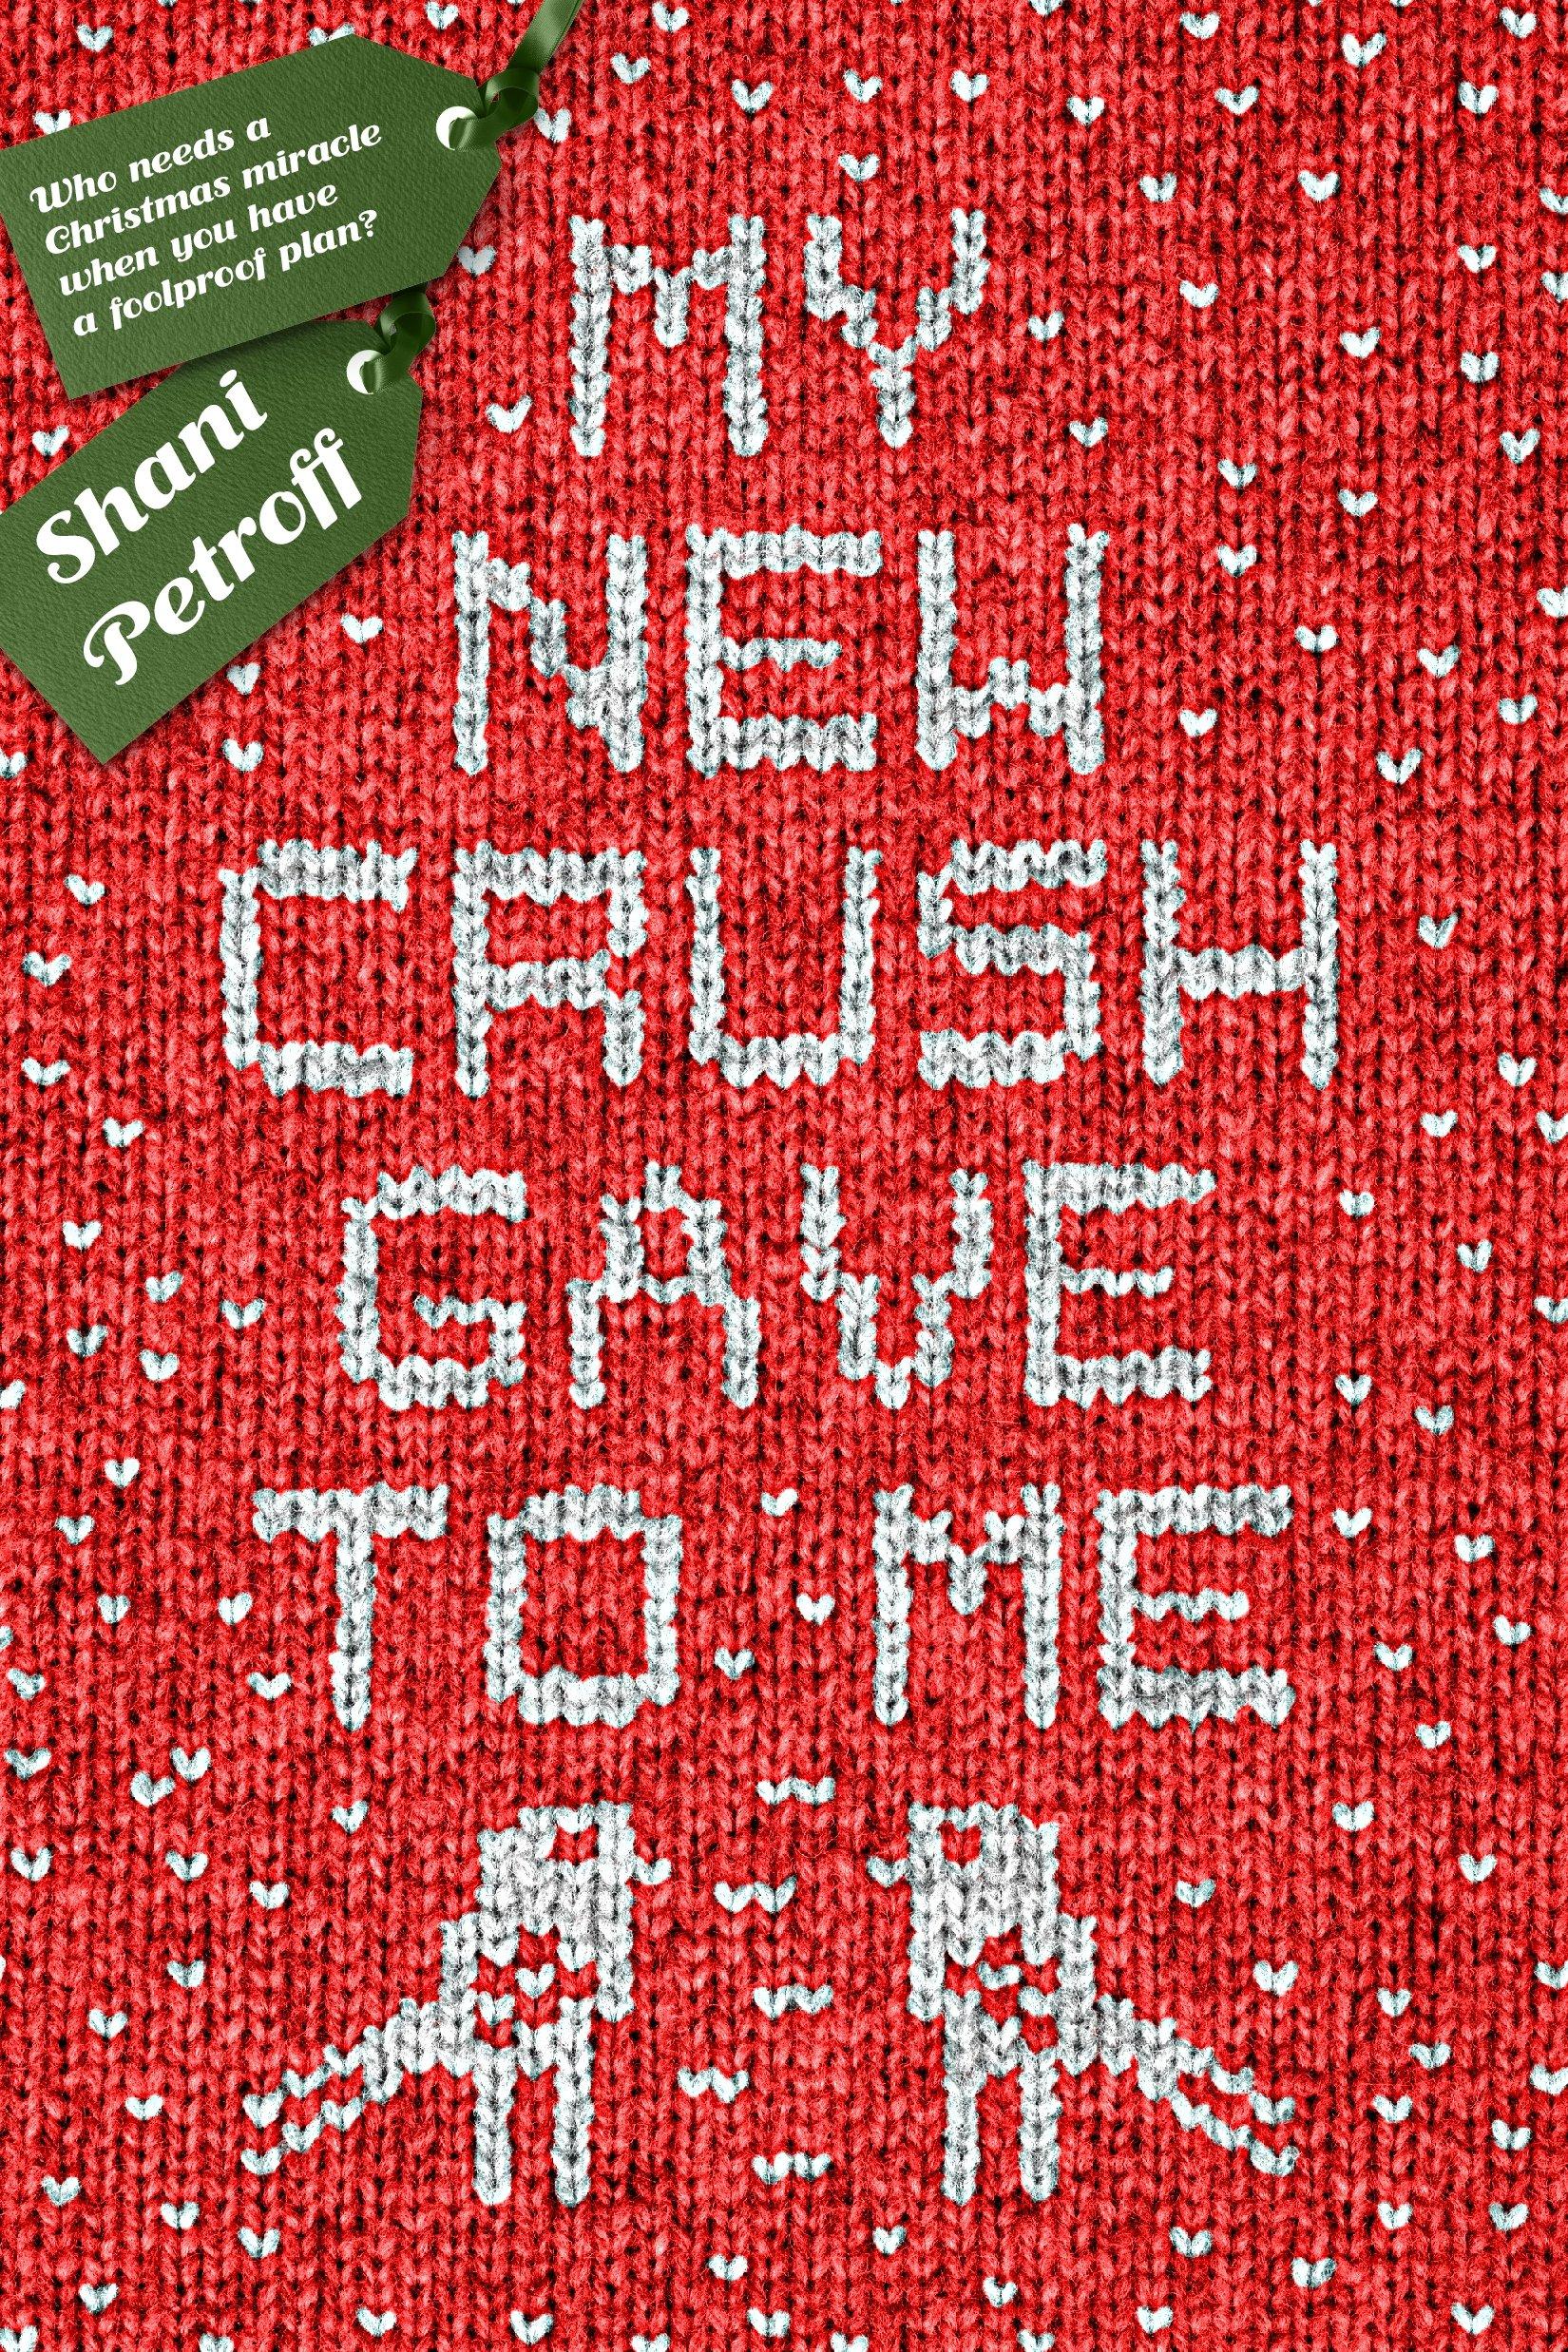 Amazon.com: My New Crush Gave to Me (9781250130327): Petroff, Shani: Books